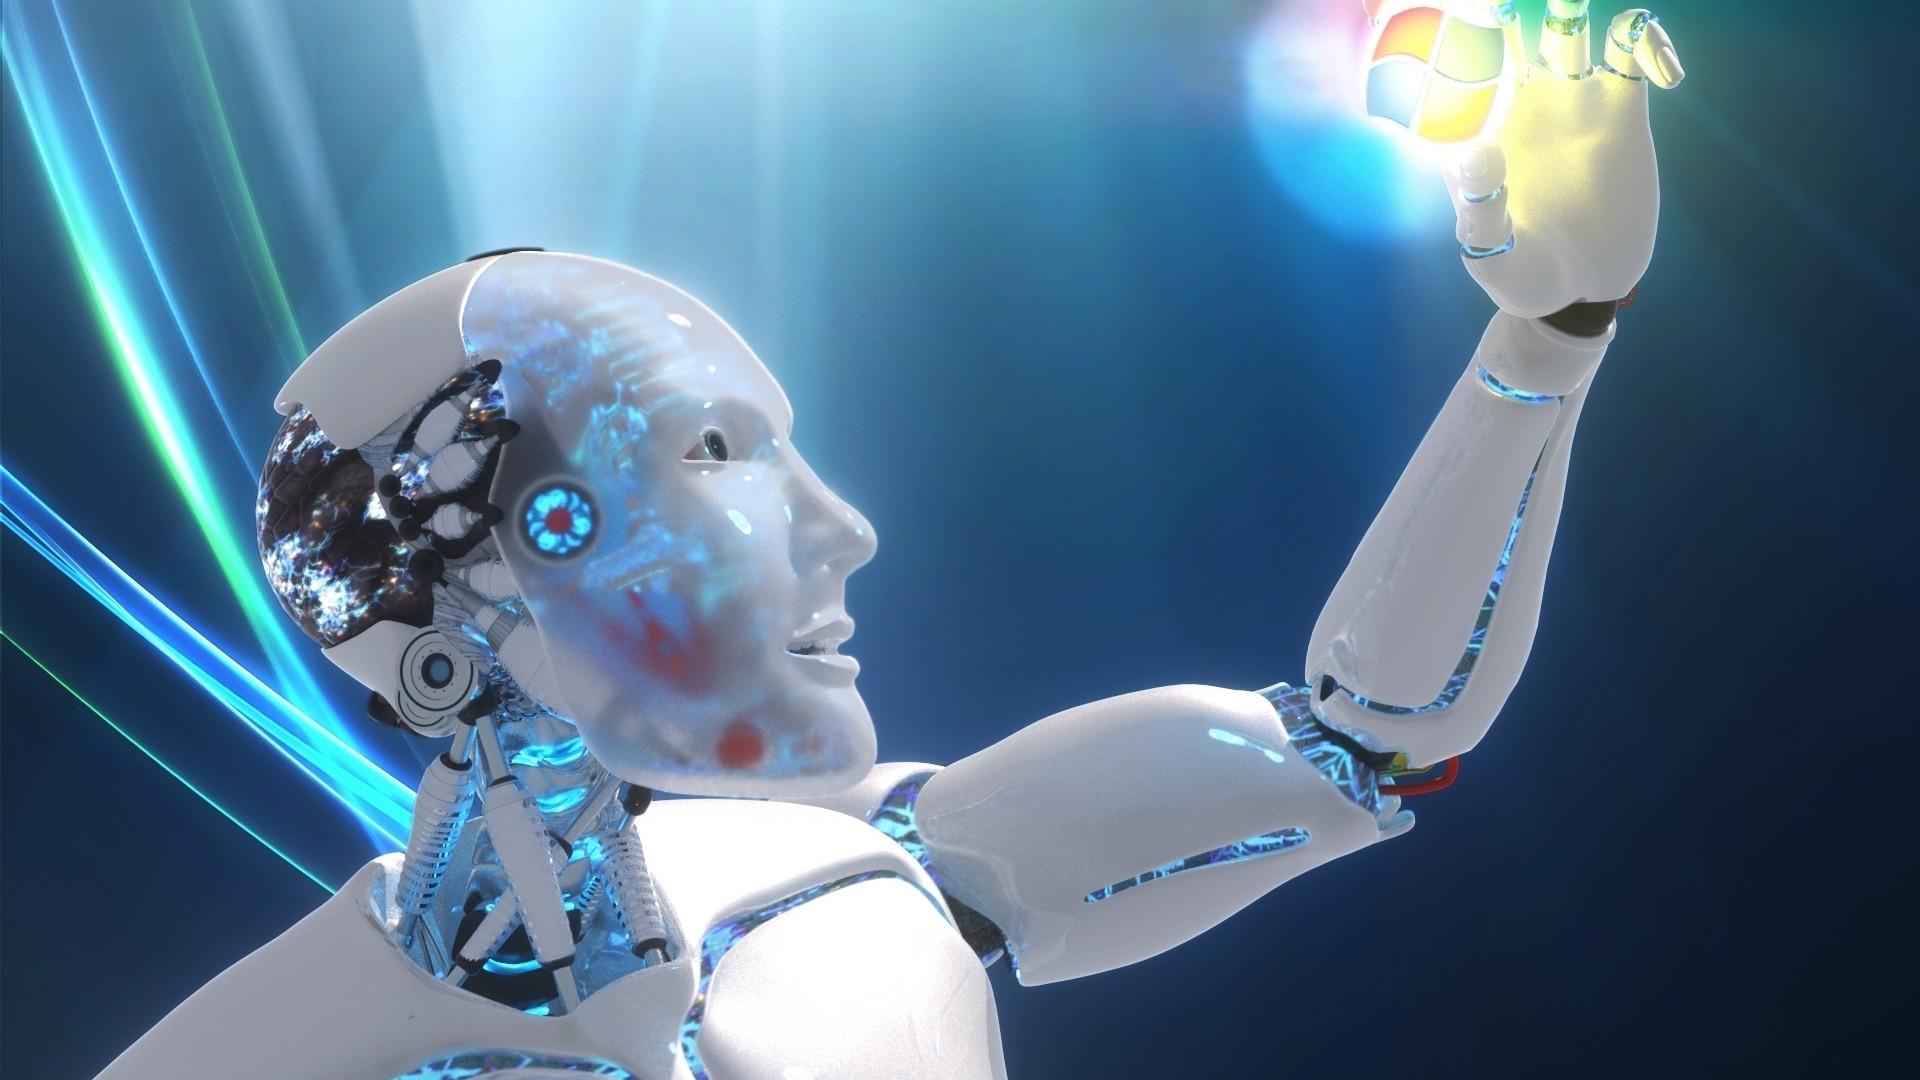 Robot Wallpaper image hd